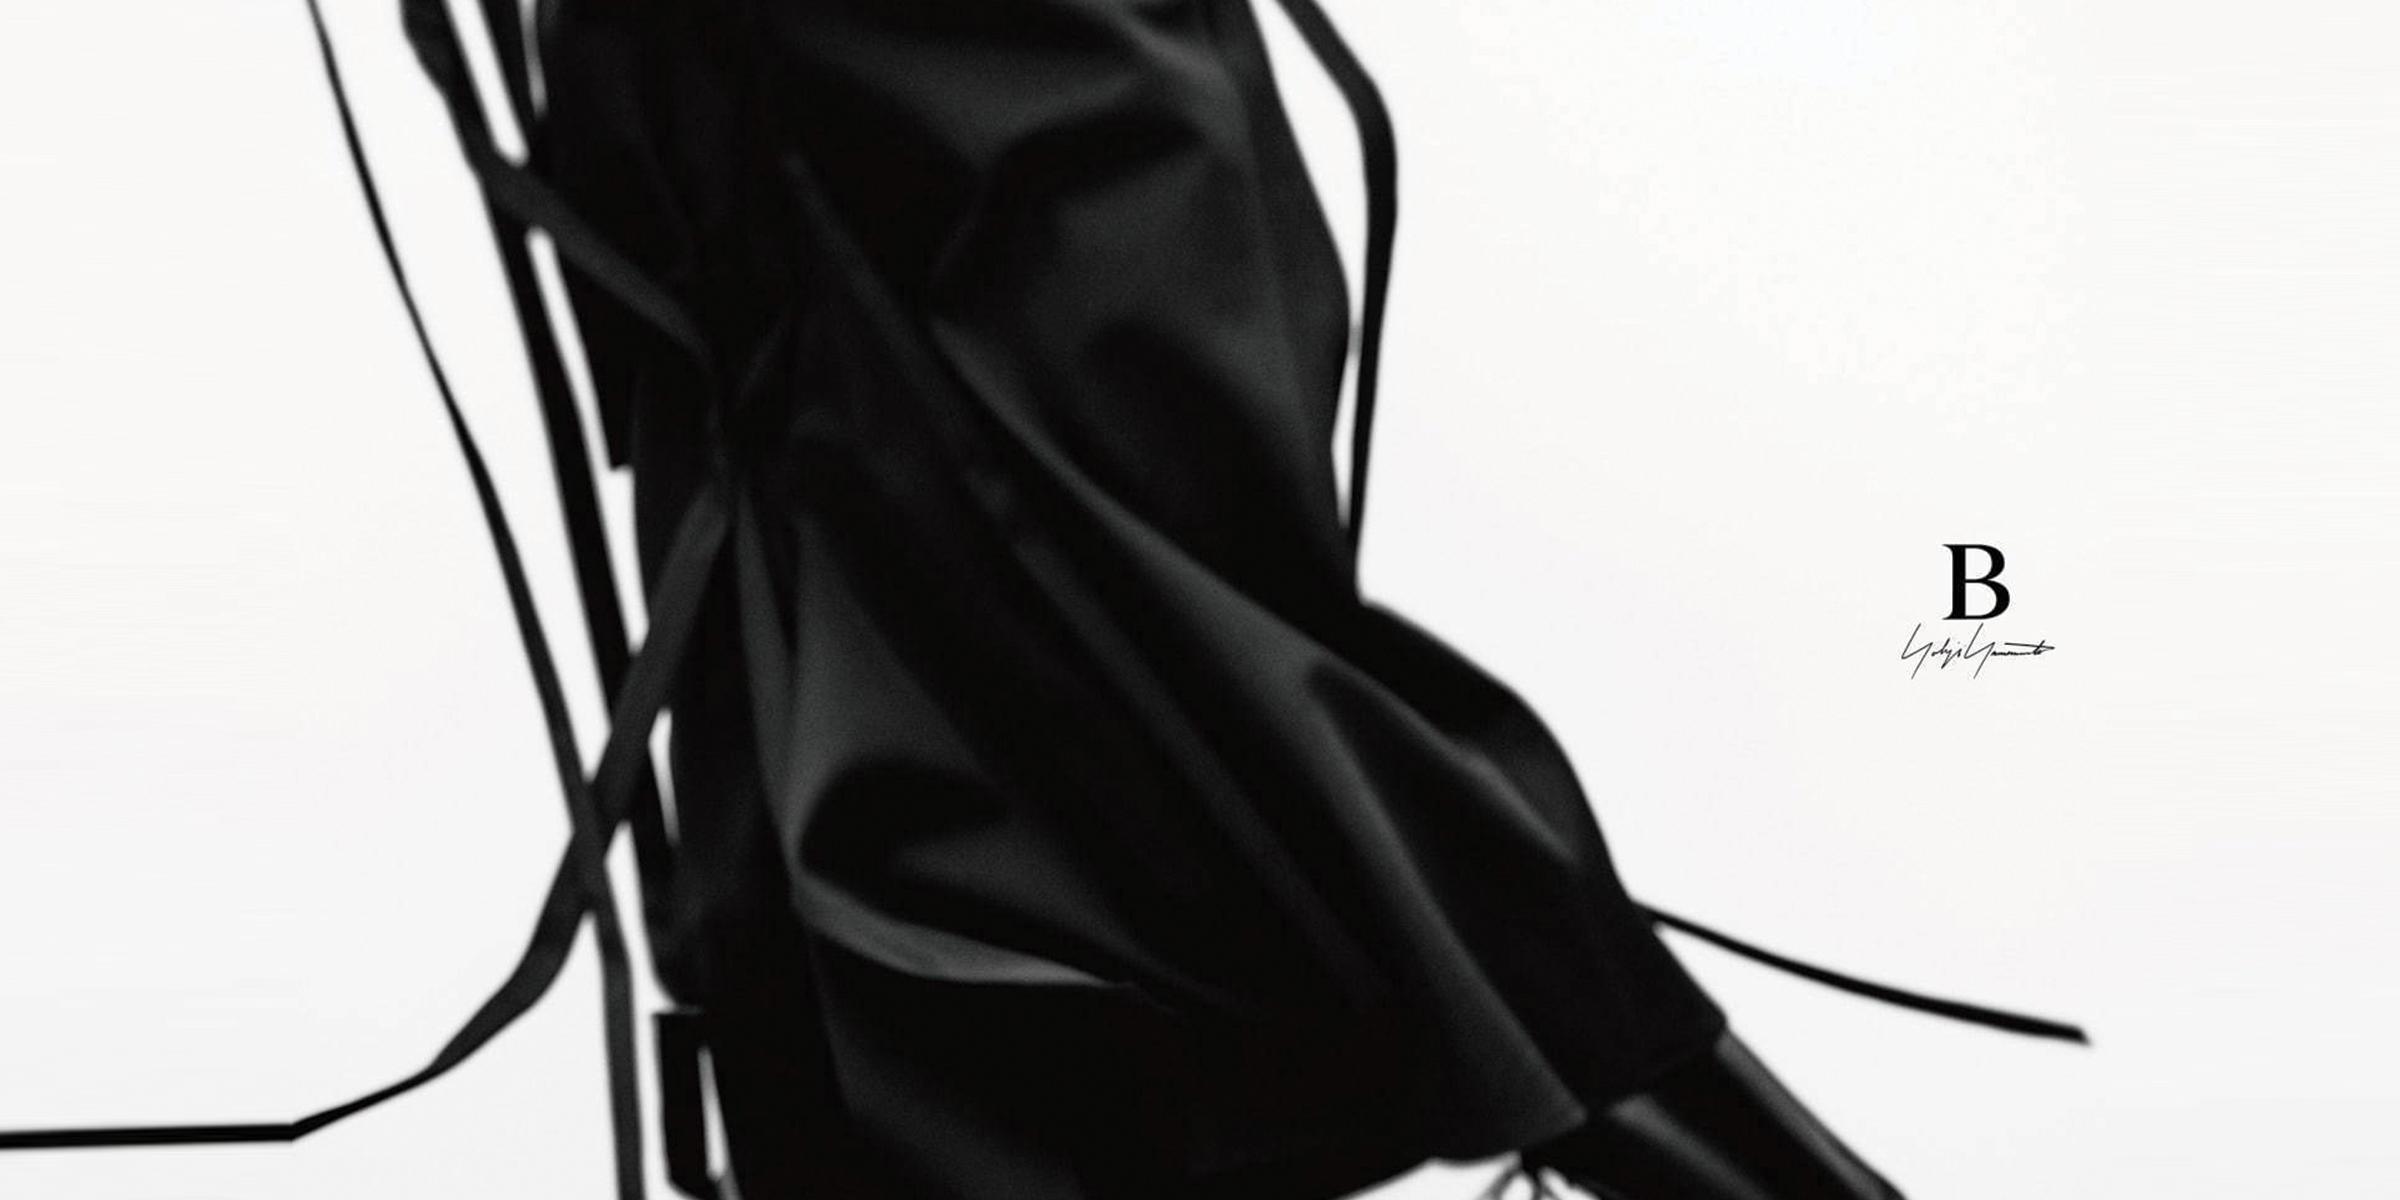 B Yohji Yamamoto 2020-21AW